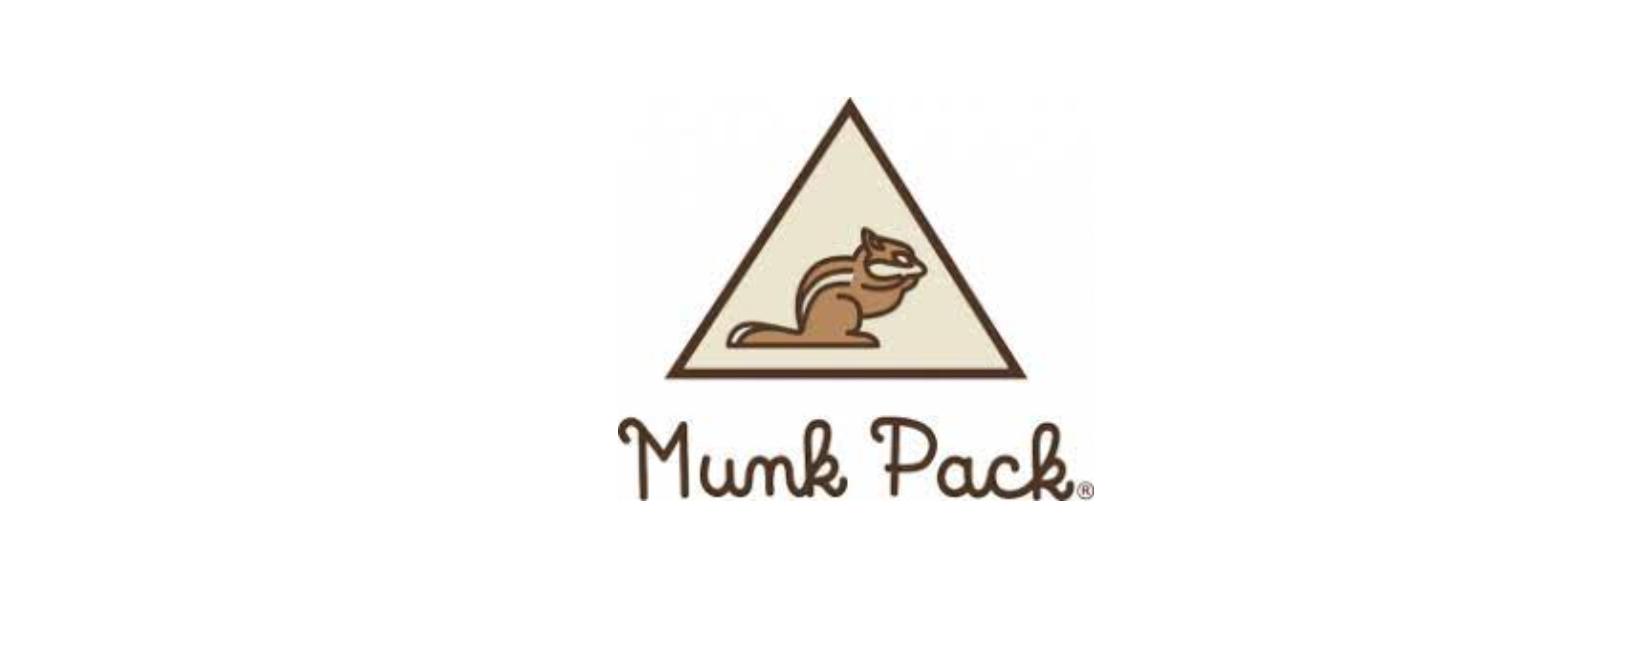 Munk Pack Discount Code 2021